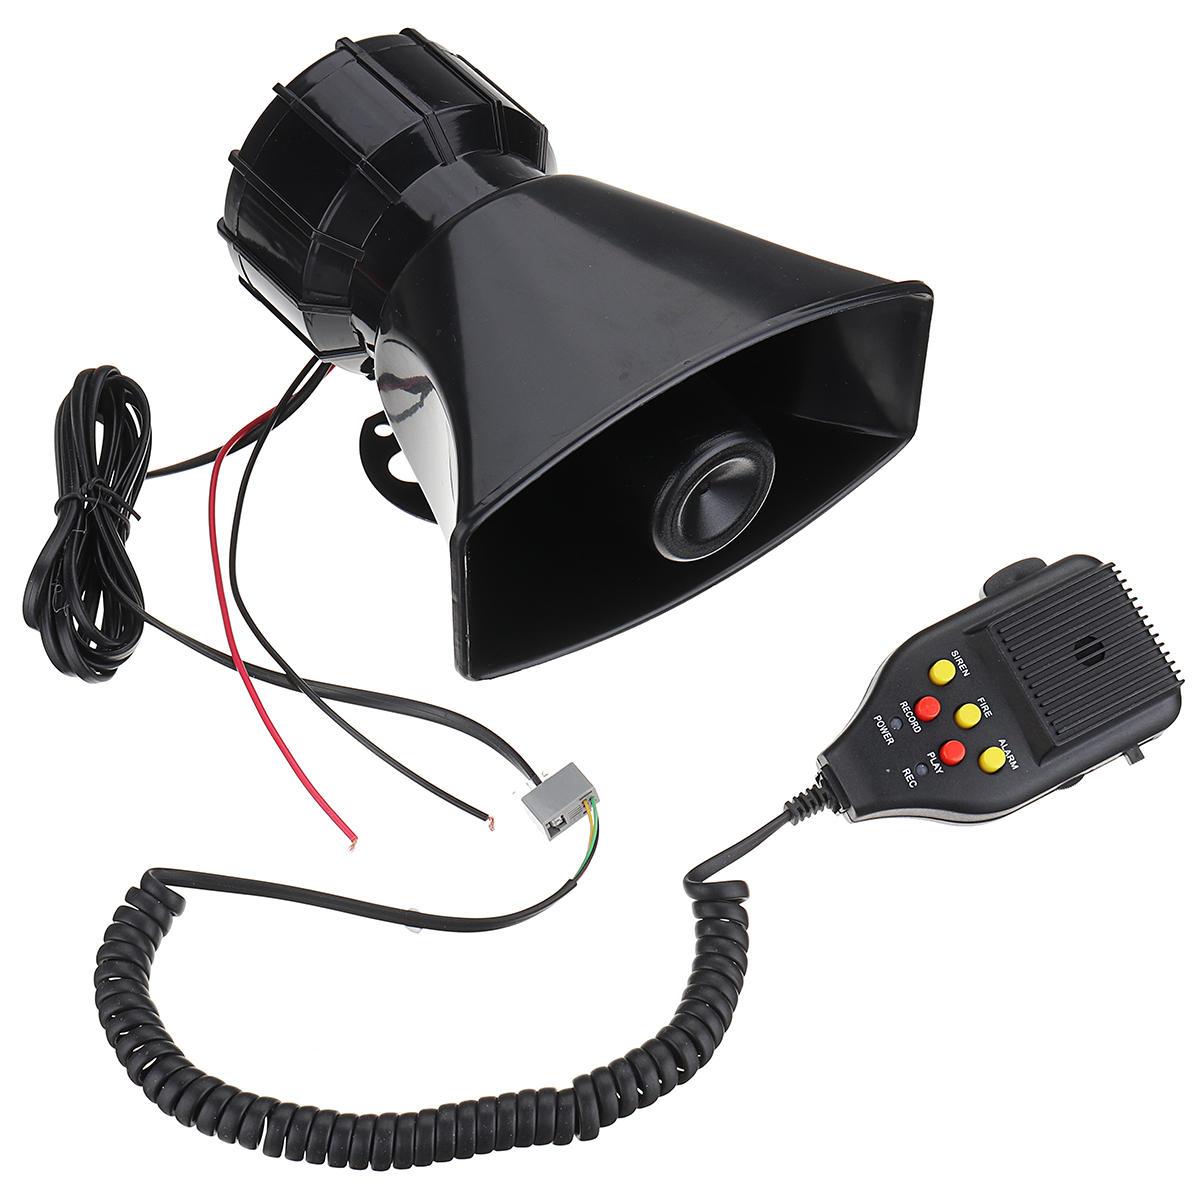 12v 3 Sound Recording Car Police Siren Horn Mic Pa Speaker System Fire Alarm Police Siren Speaker System Sound Recordings